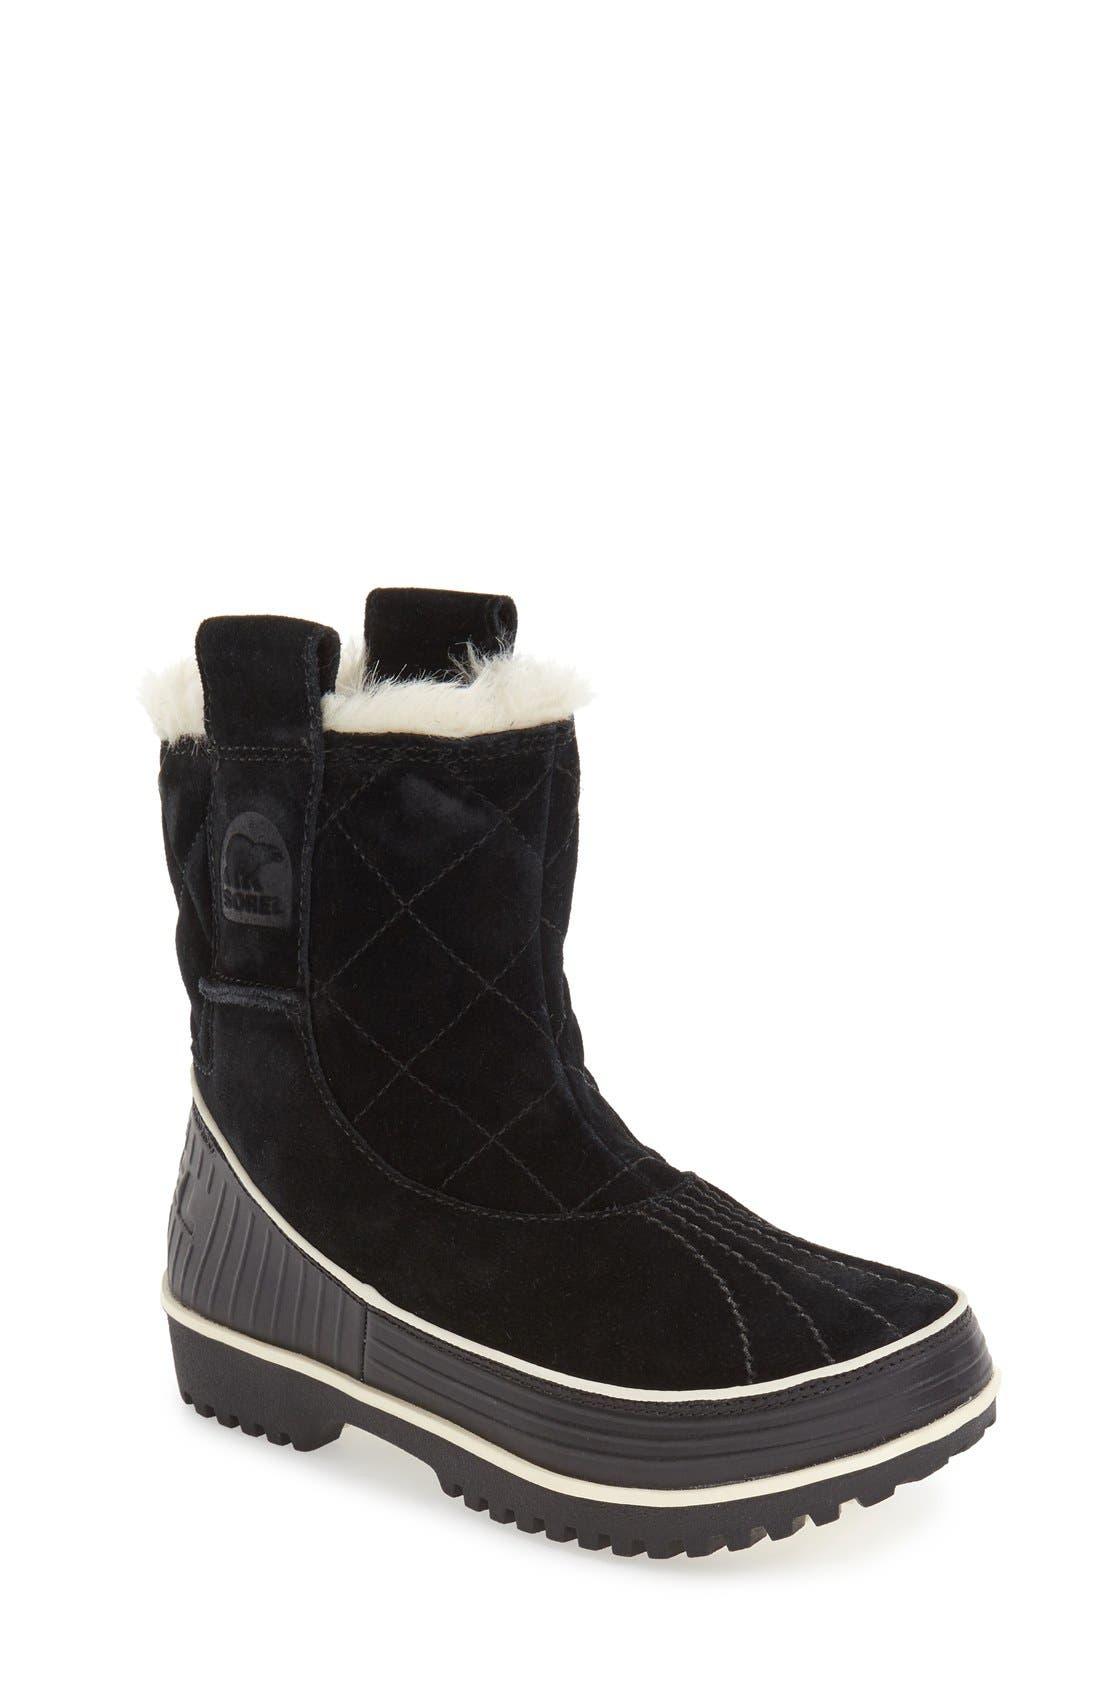 Alternate Image 1 Selected - SOREL 'Tivoli II' Waterproof Snow Boot (Women)